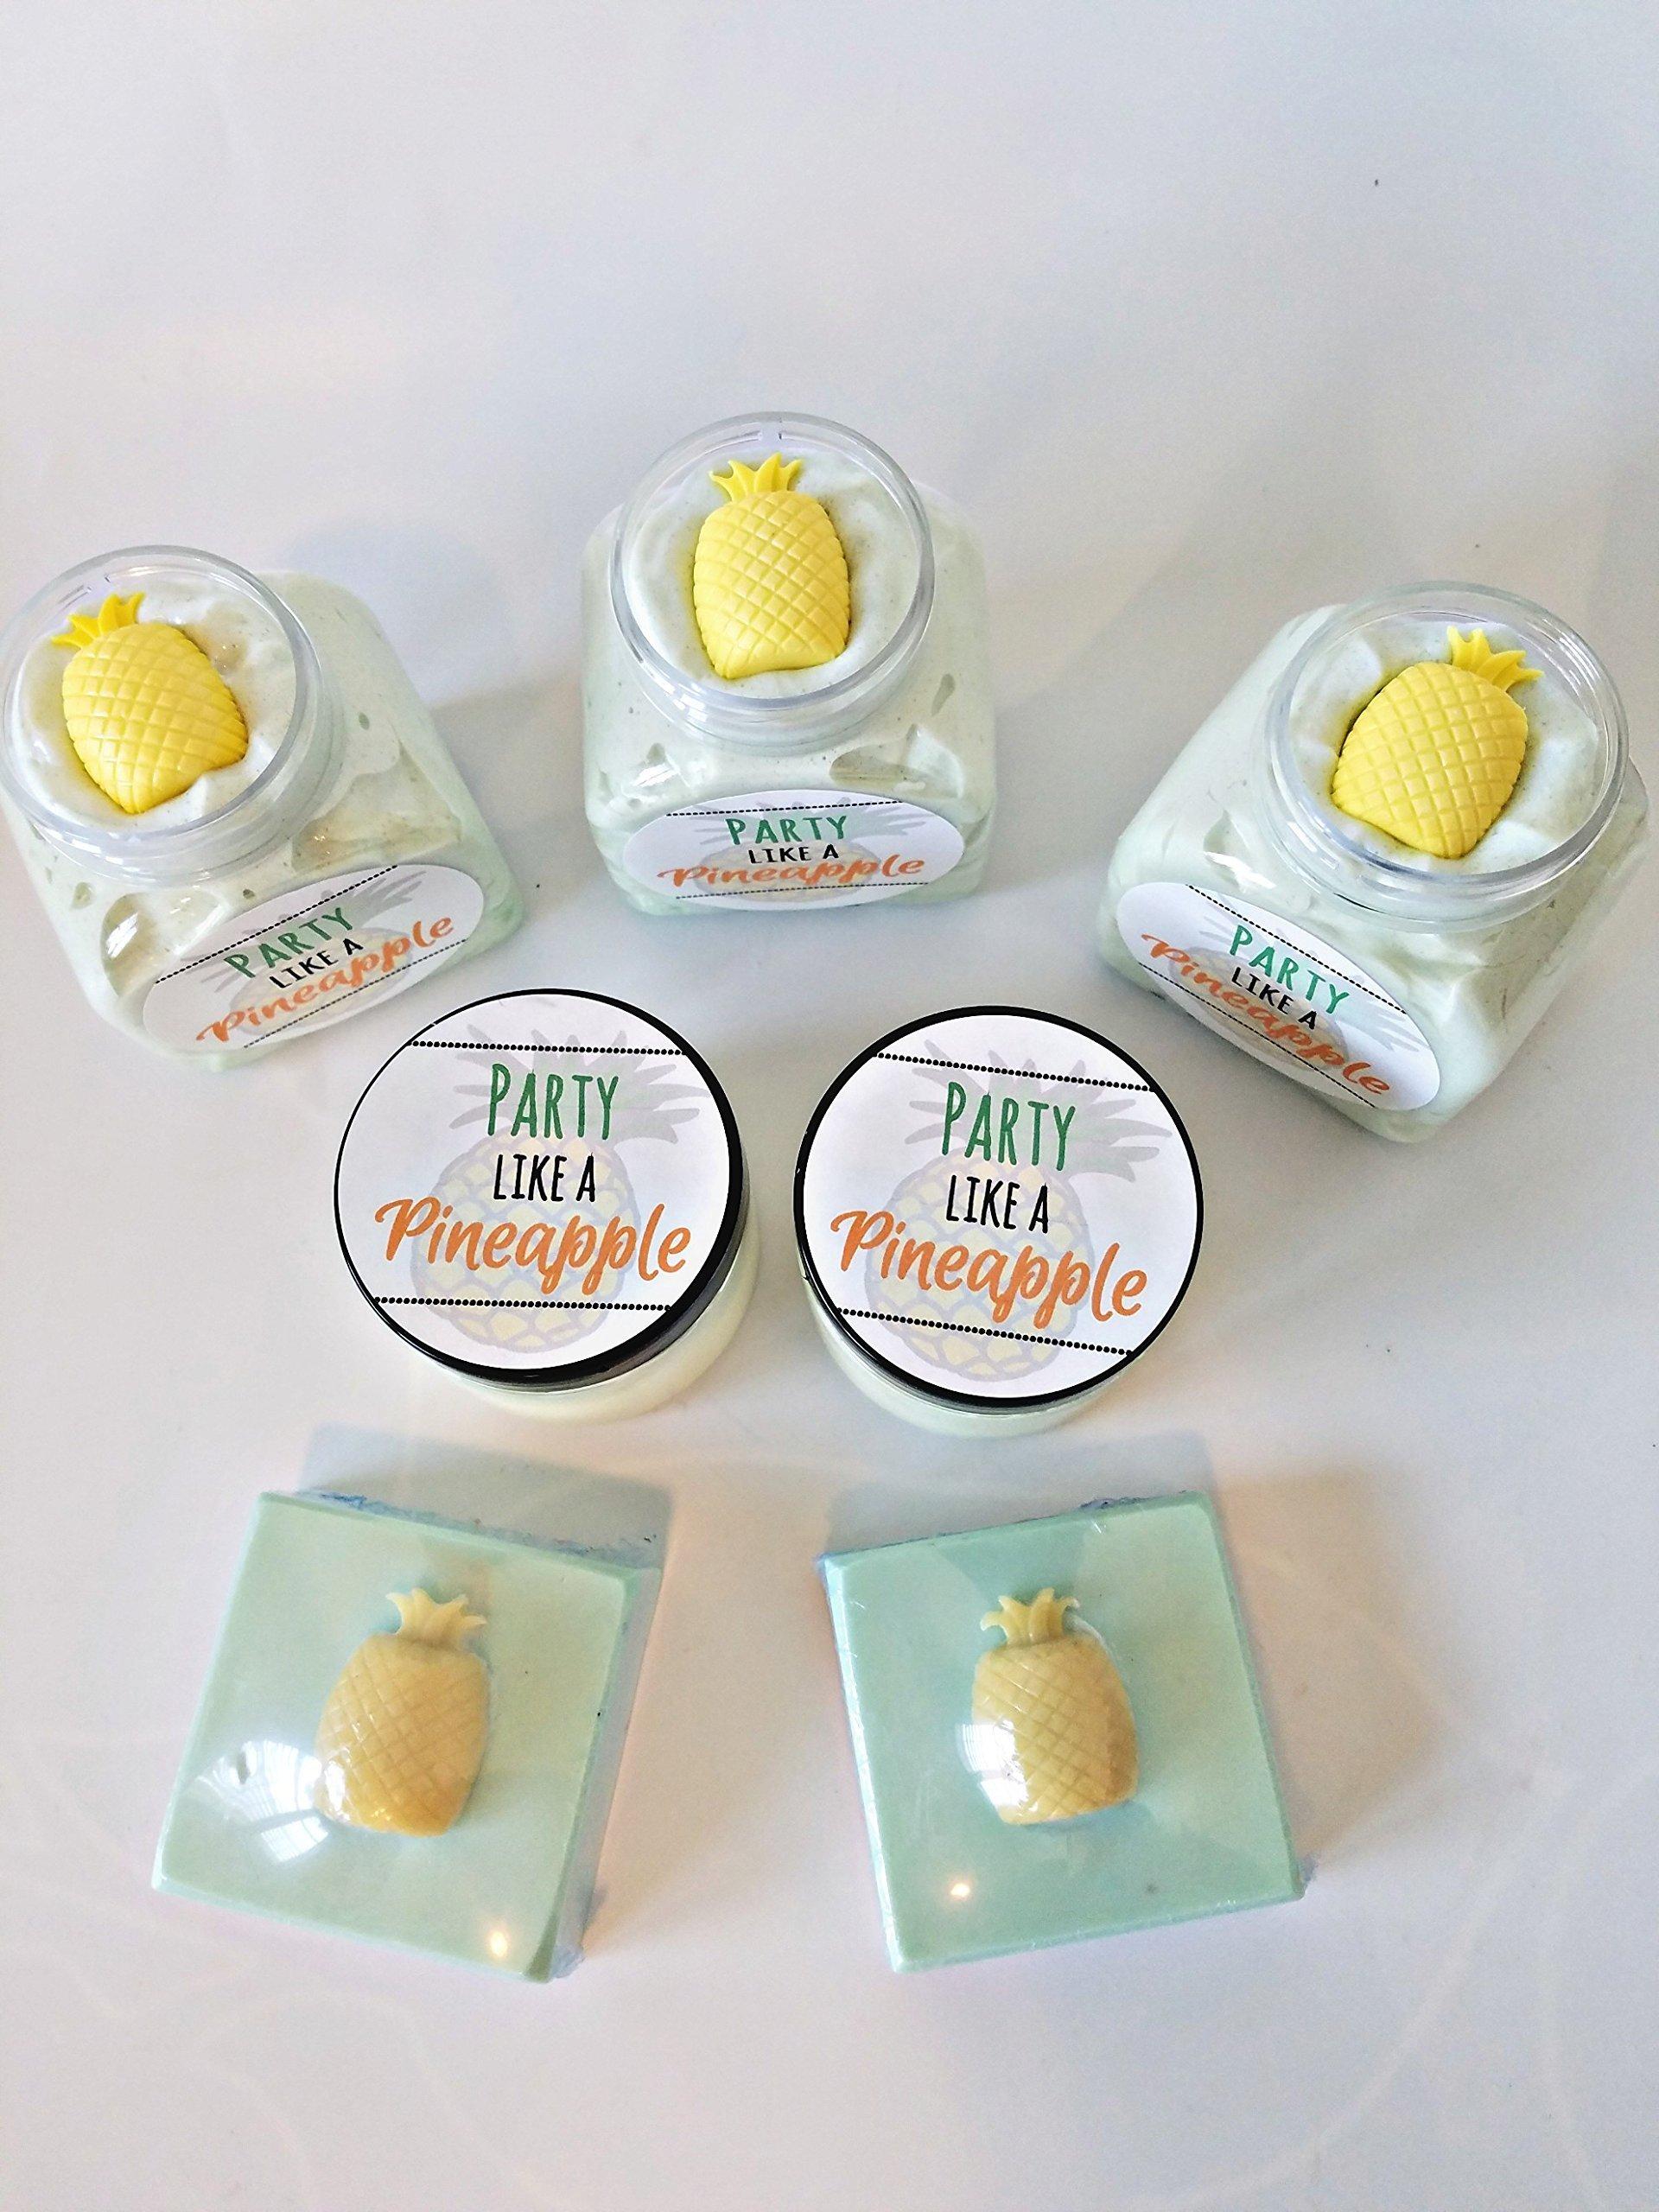 Pineapple Whipped Sugar Soap Scrub | Body Butter | Handmade Soap | Gift For Her | Gift For Mom | Tropical Gift | Pineapple | Pina Colada | Piña